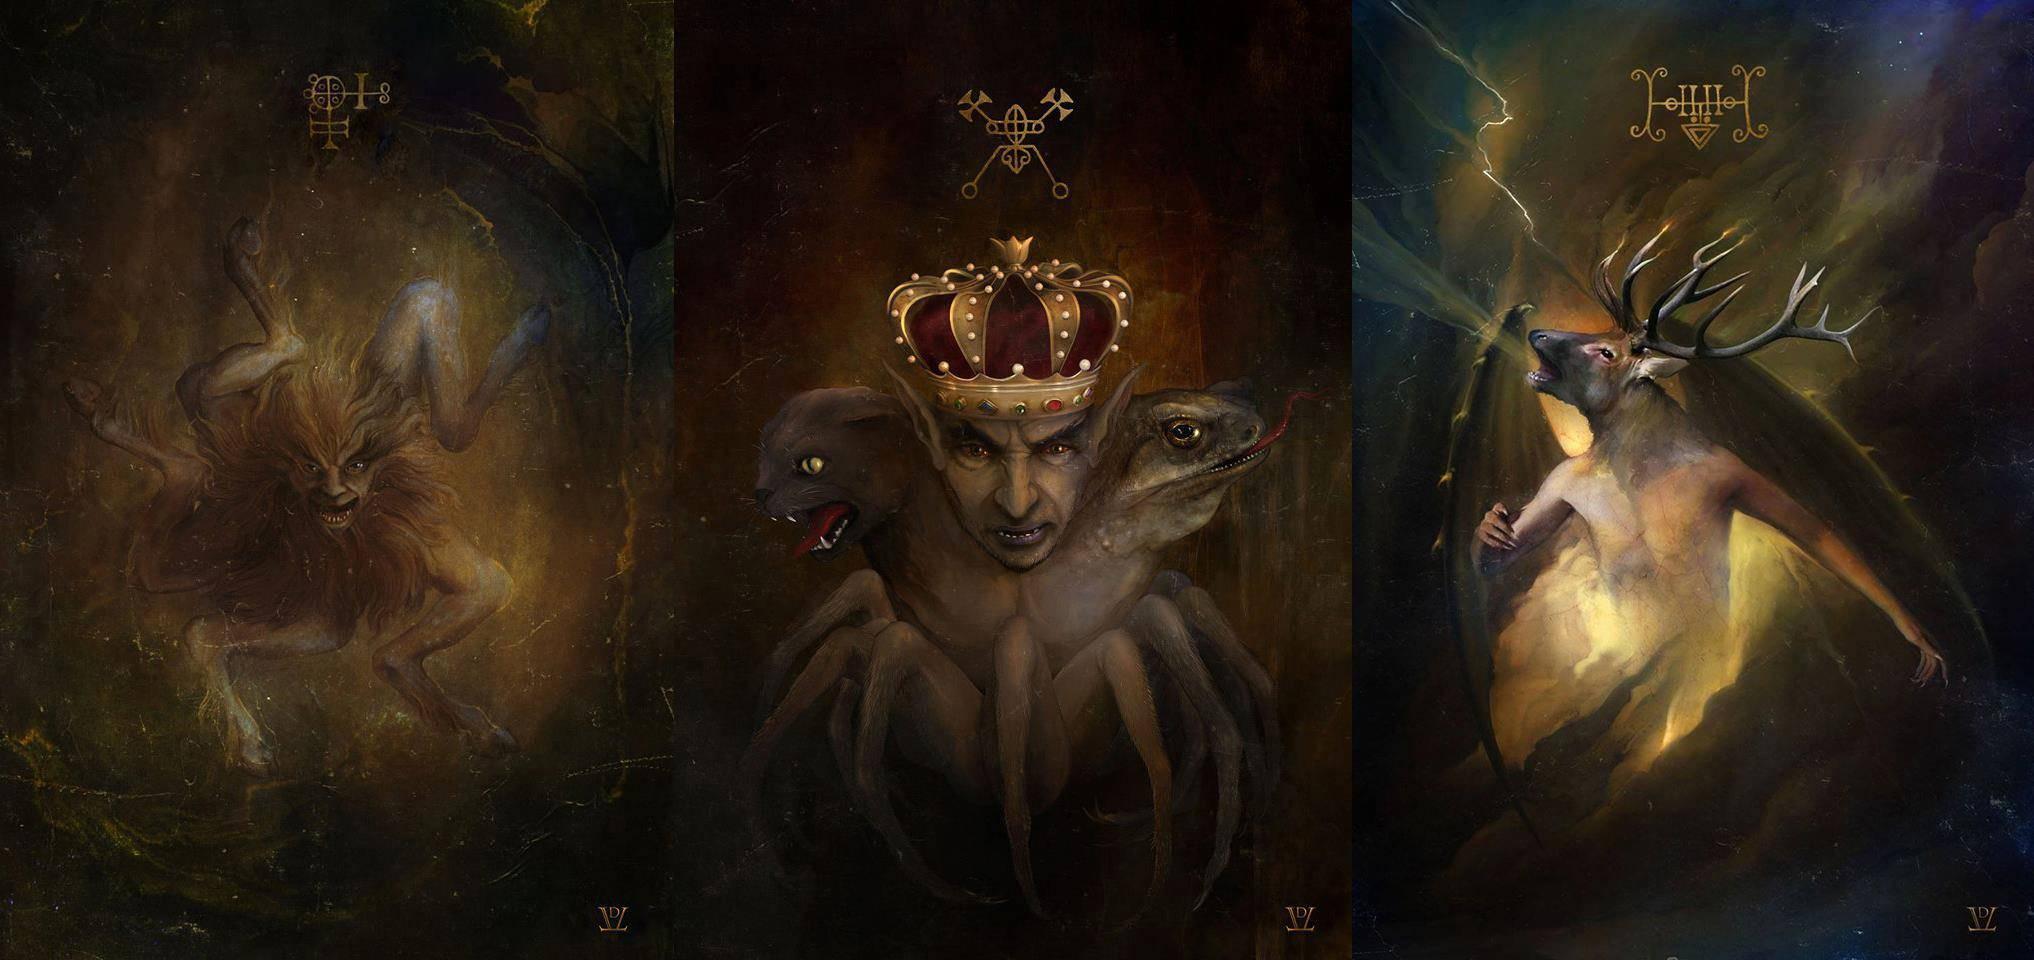 Демоны двенадцати лун | клинок, рассекающий демонов вики | fandom